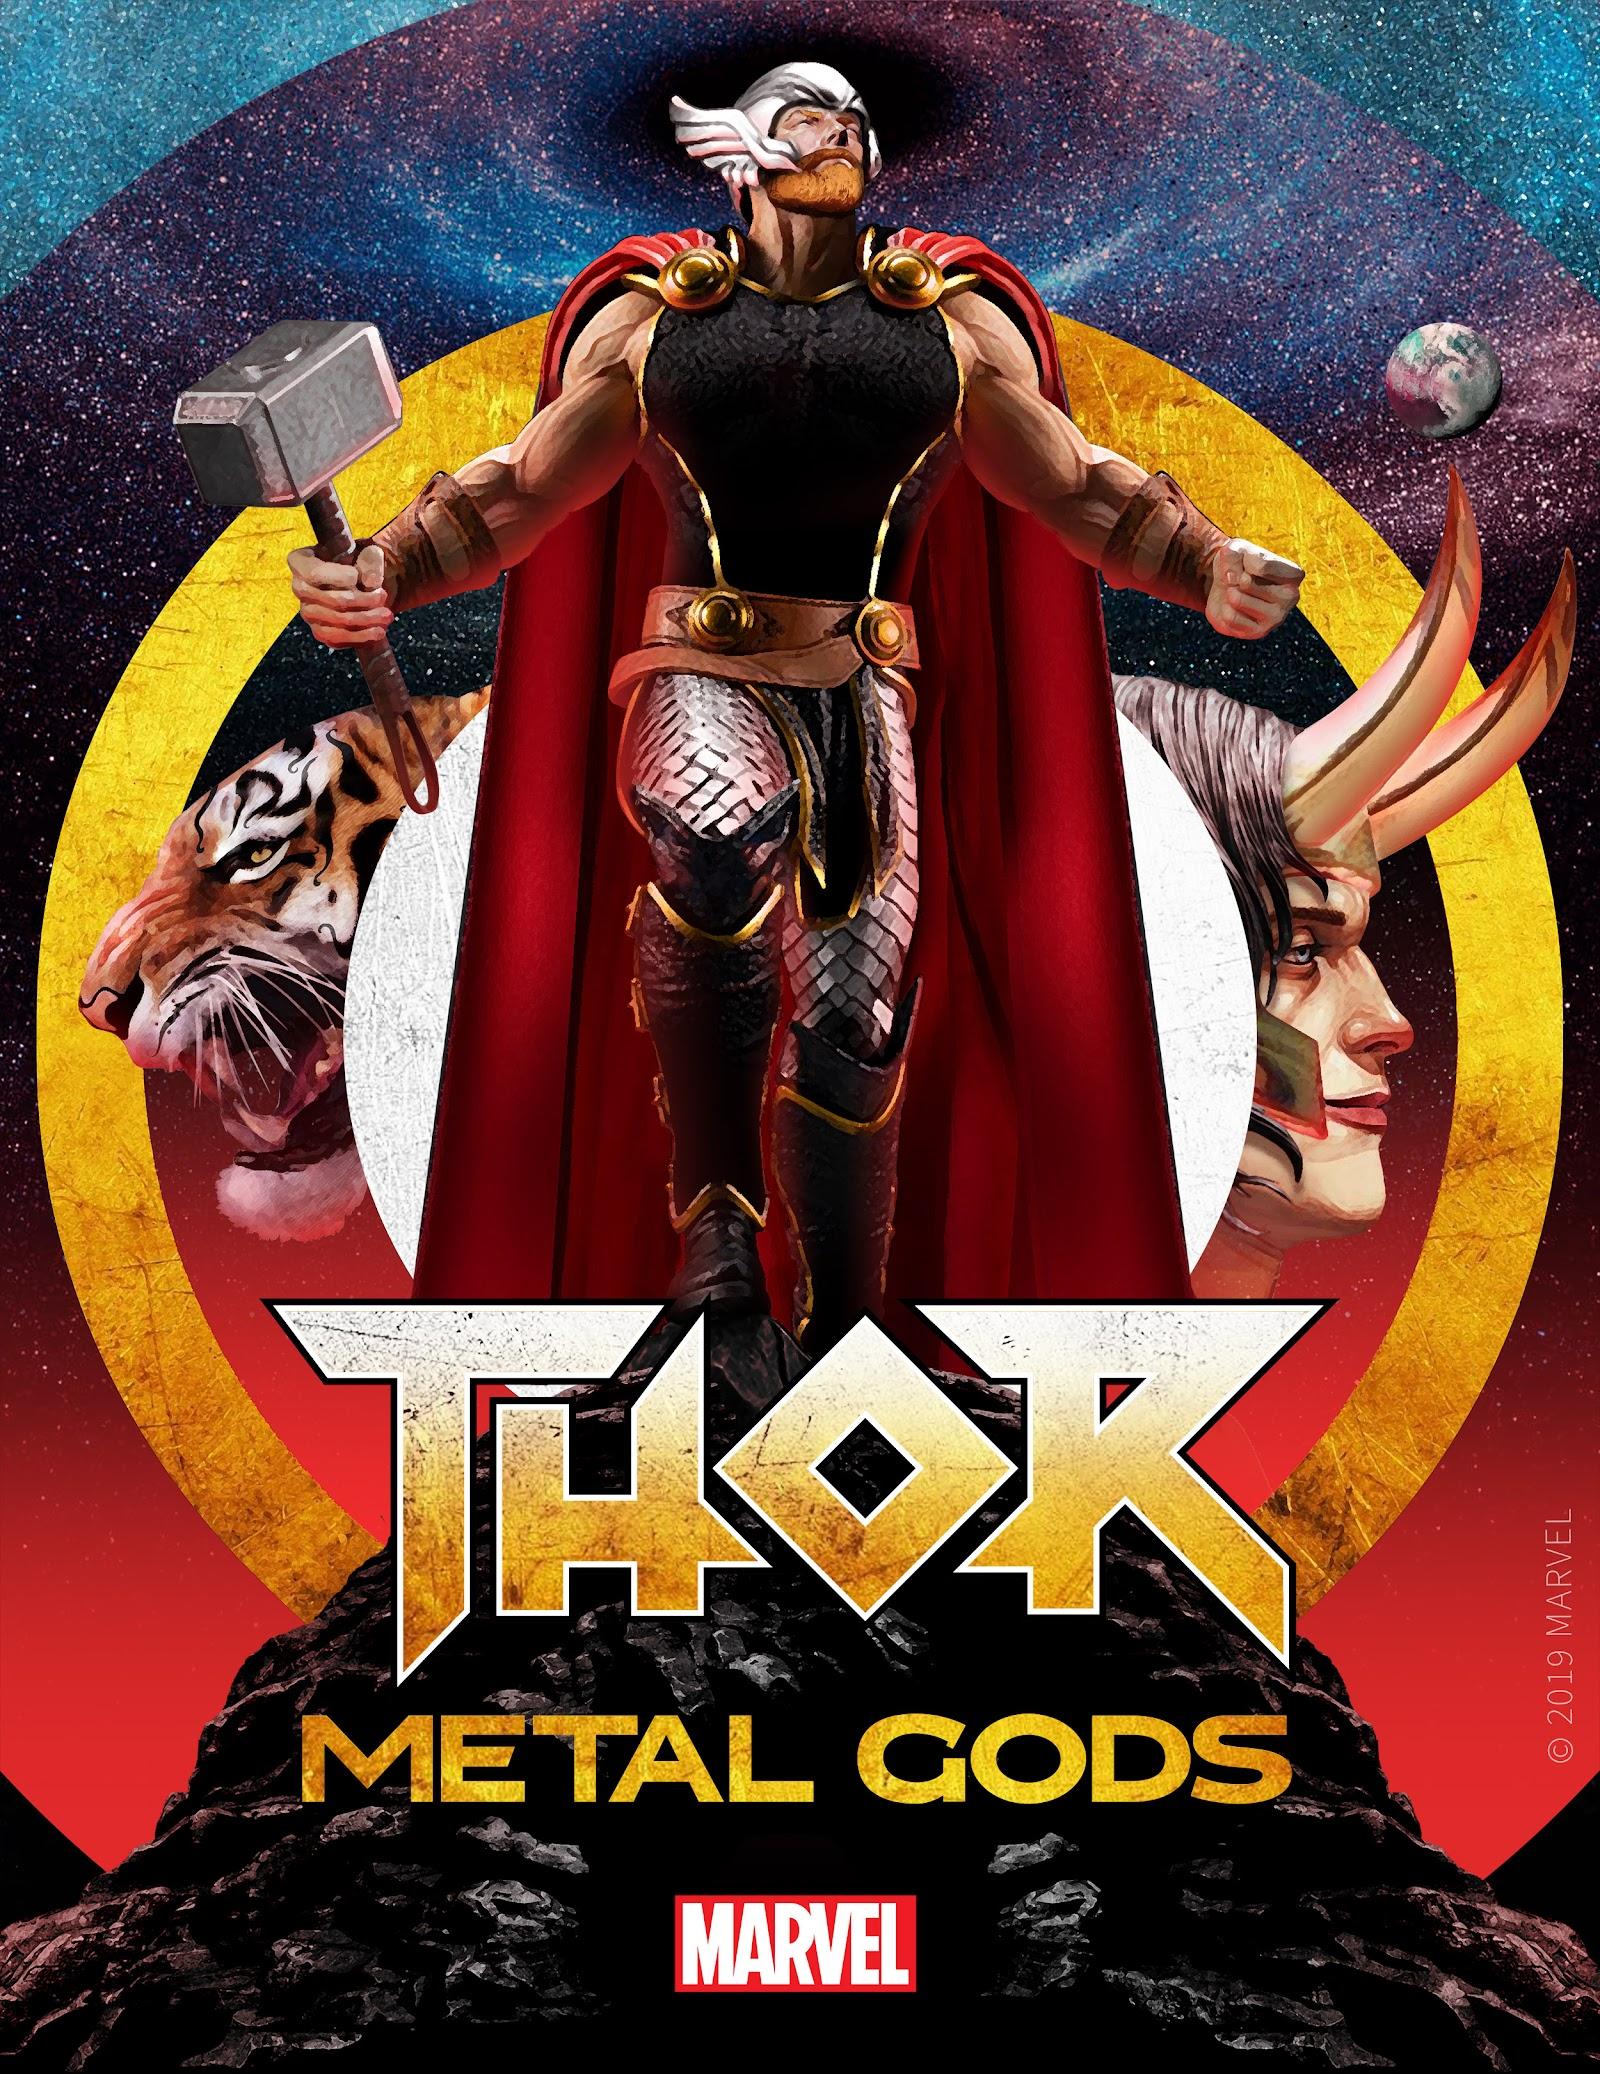 thor metal gods